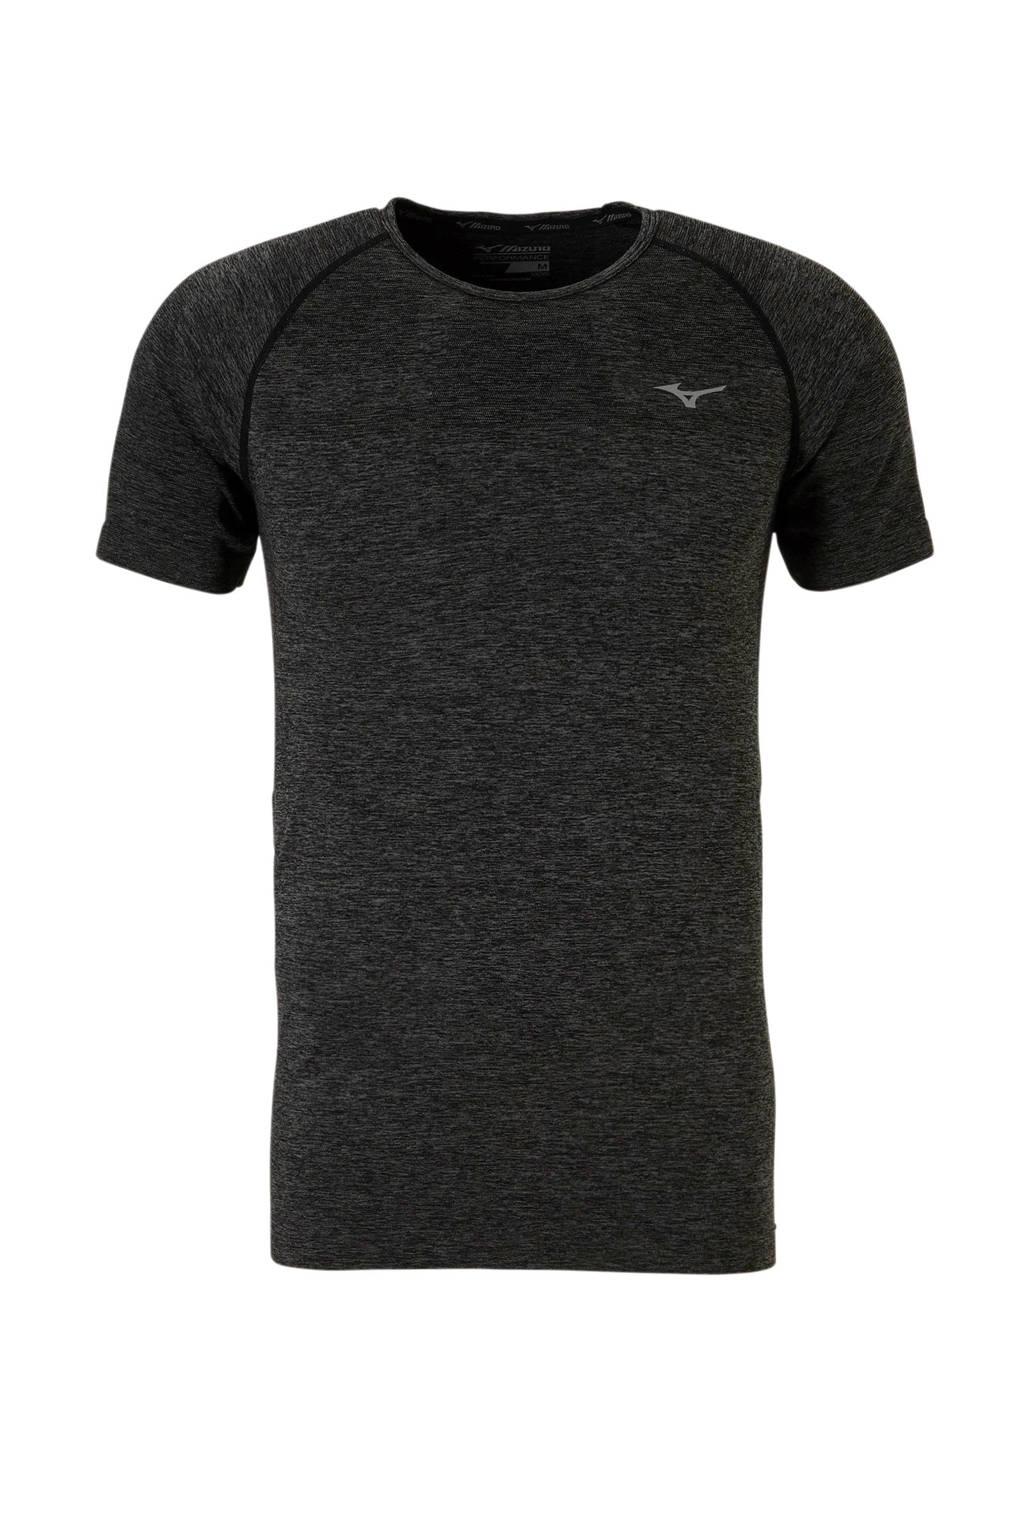 Mizuno   sport T-shirt grijs, Grijs